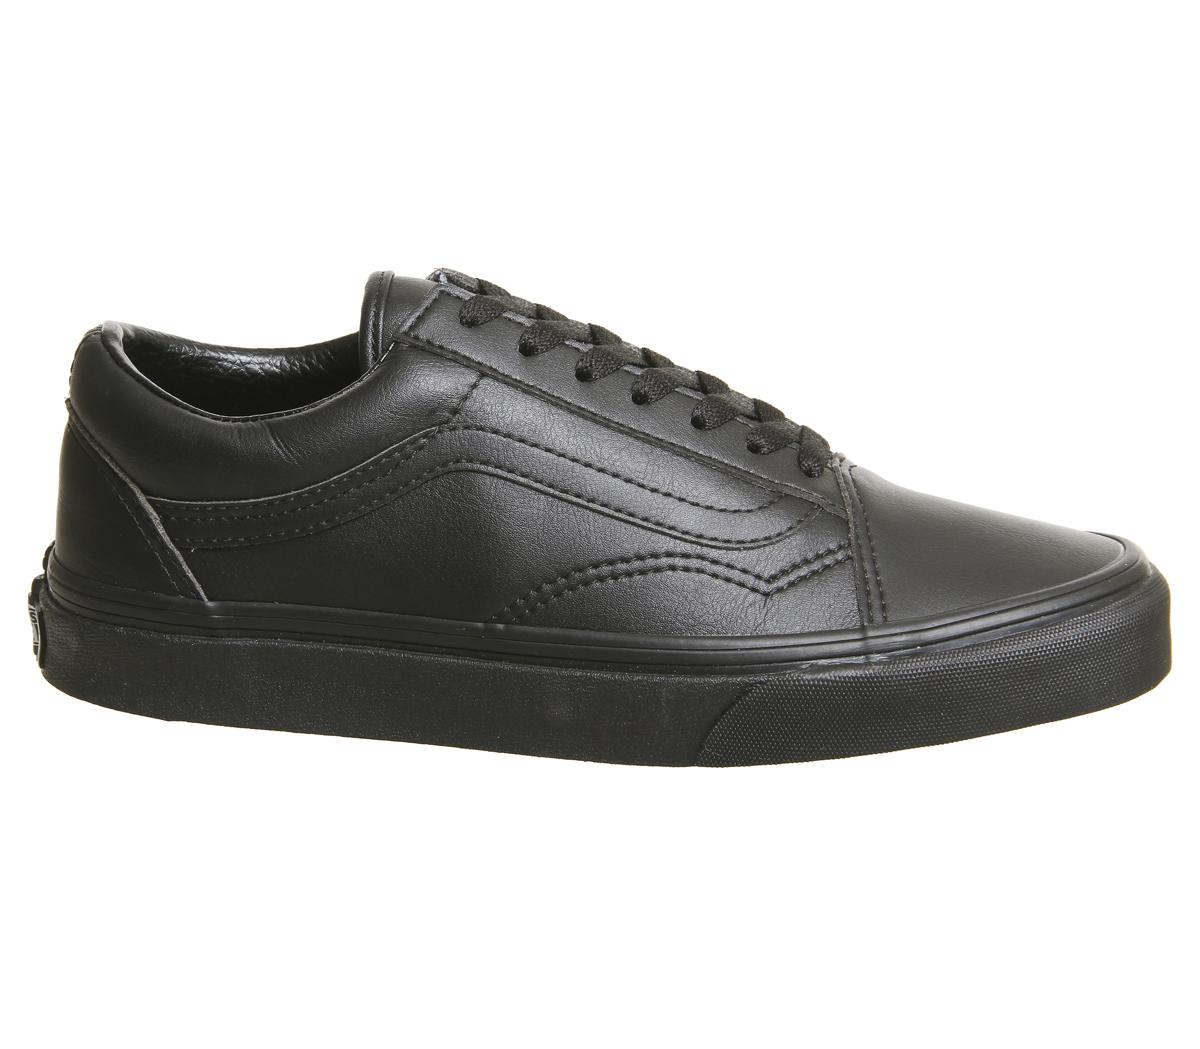 Sentinel Mens Vans Old Skool Trainers BLACK BLACK MONO LEATHER Trainers  Shoes 8fa8baa1c